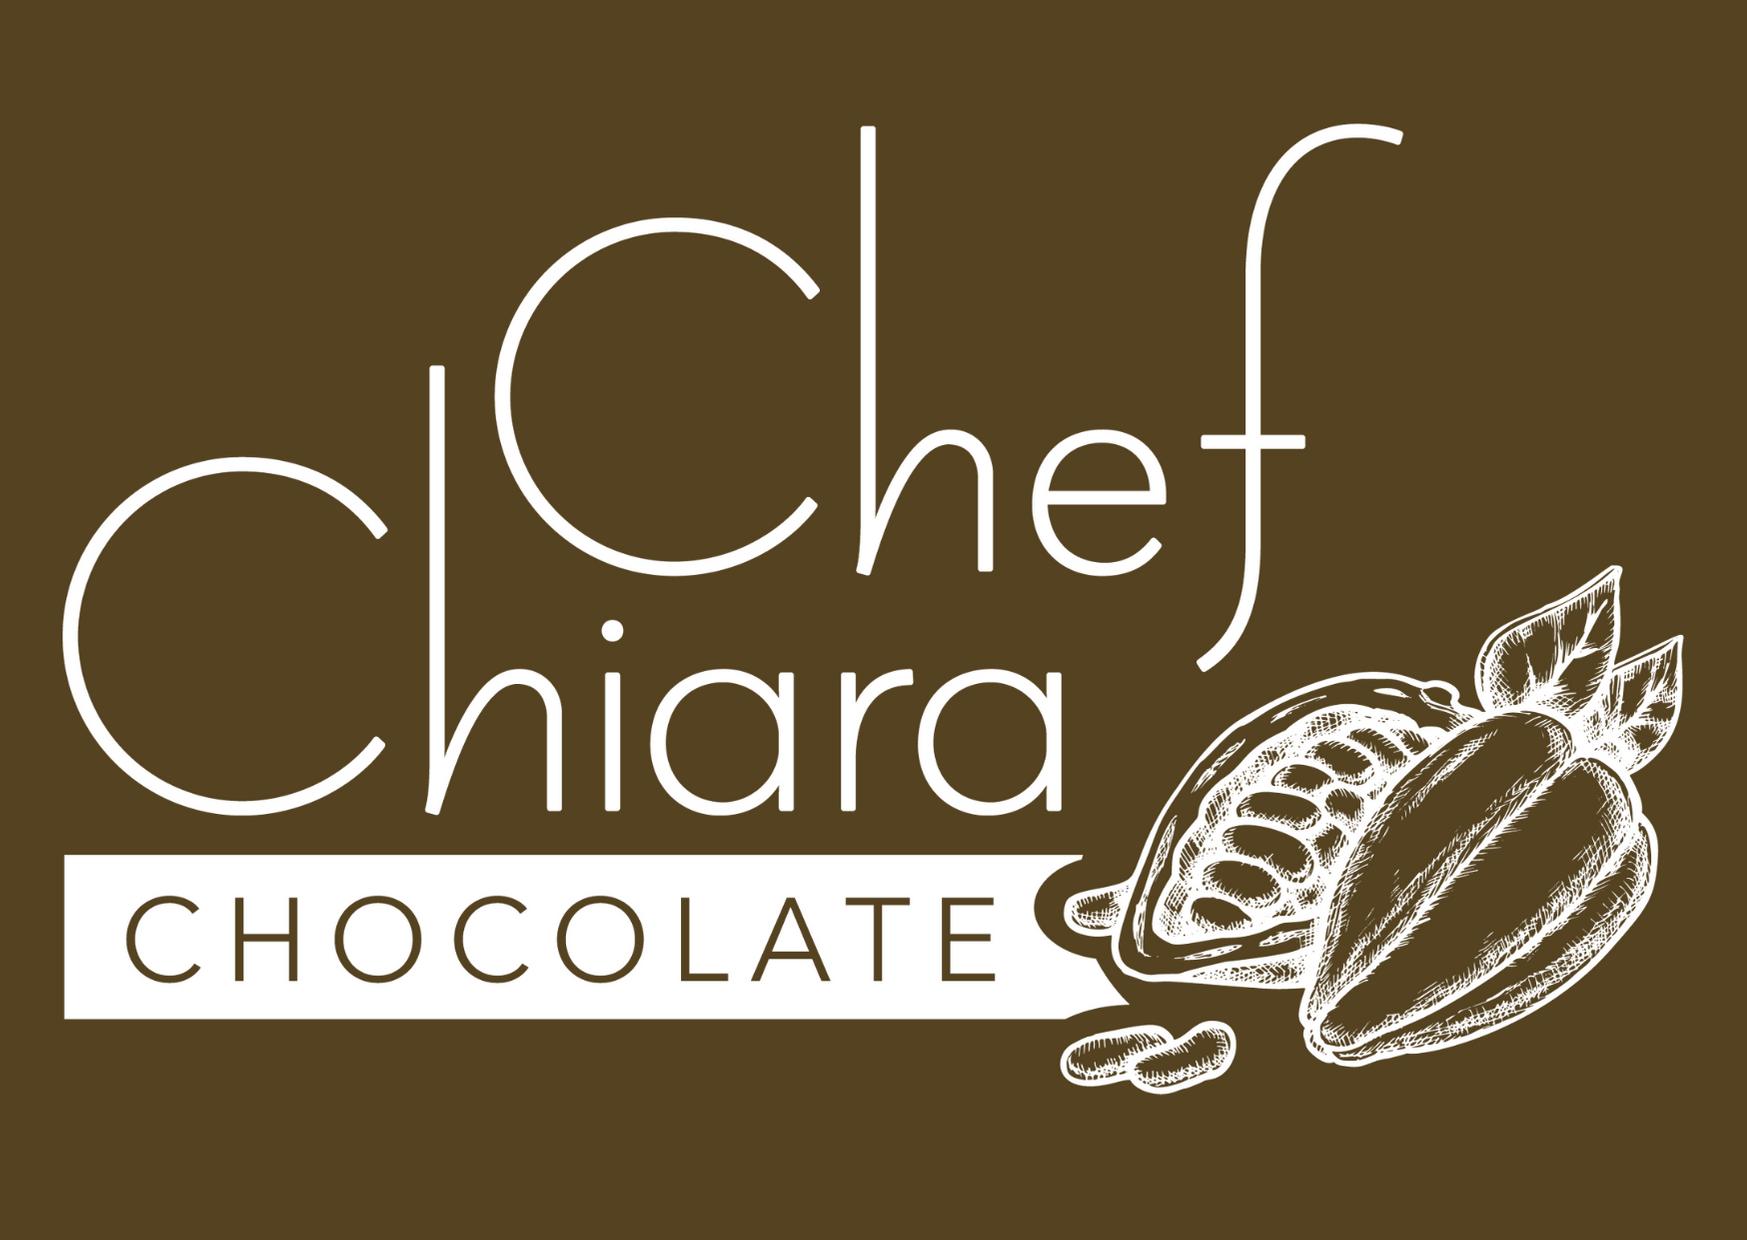 Chocolate by chef chiara